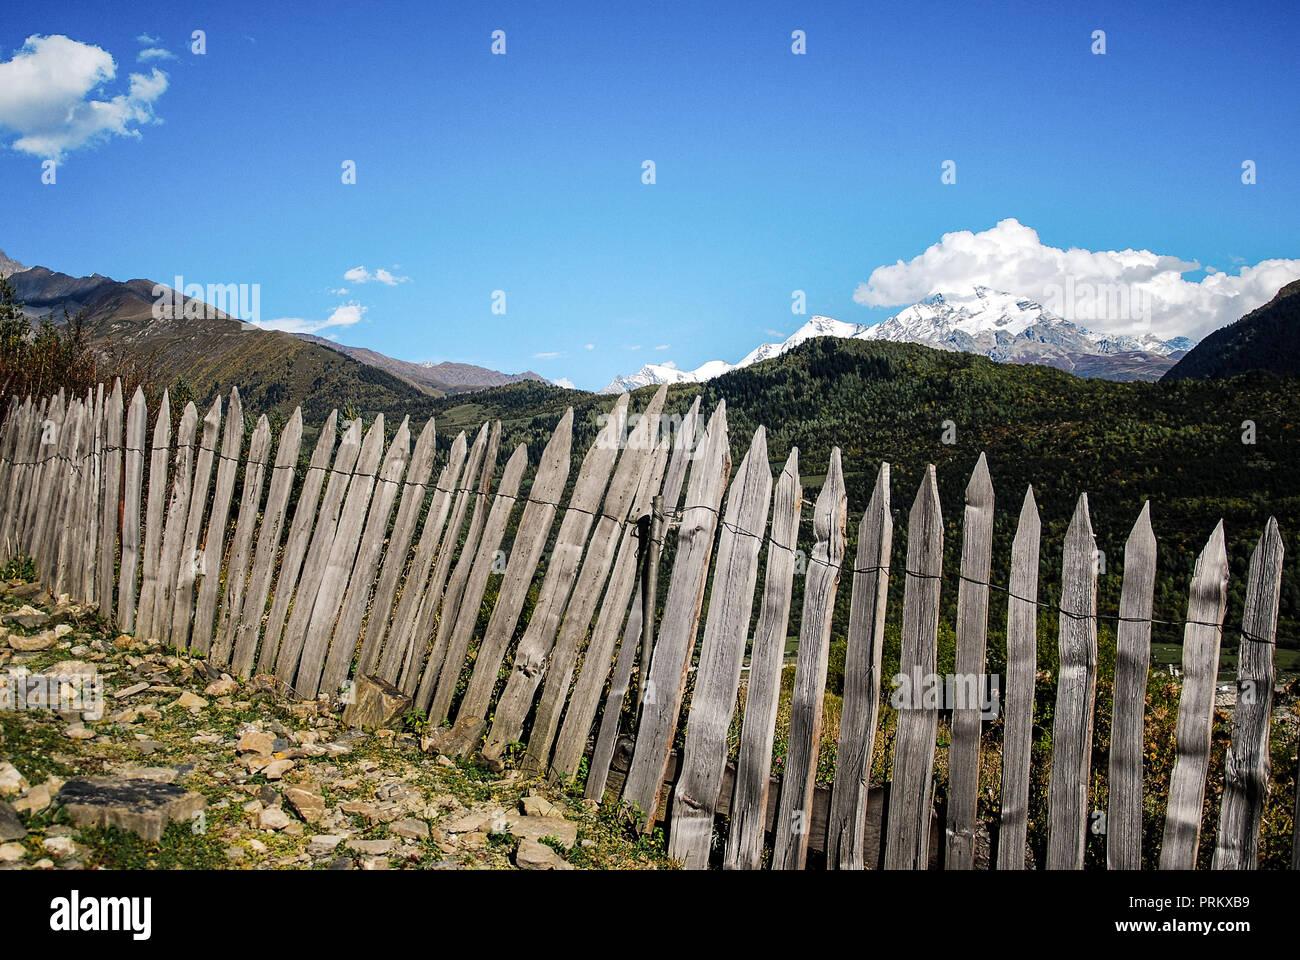 Crooked wooden fence on a mountain landscape in Mestia, Svaneti, Georgia - Stock Image